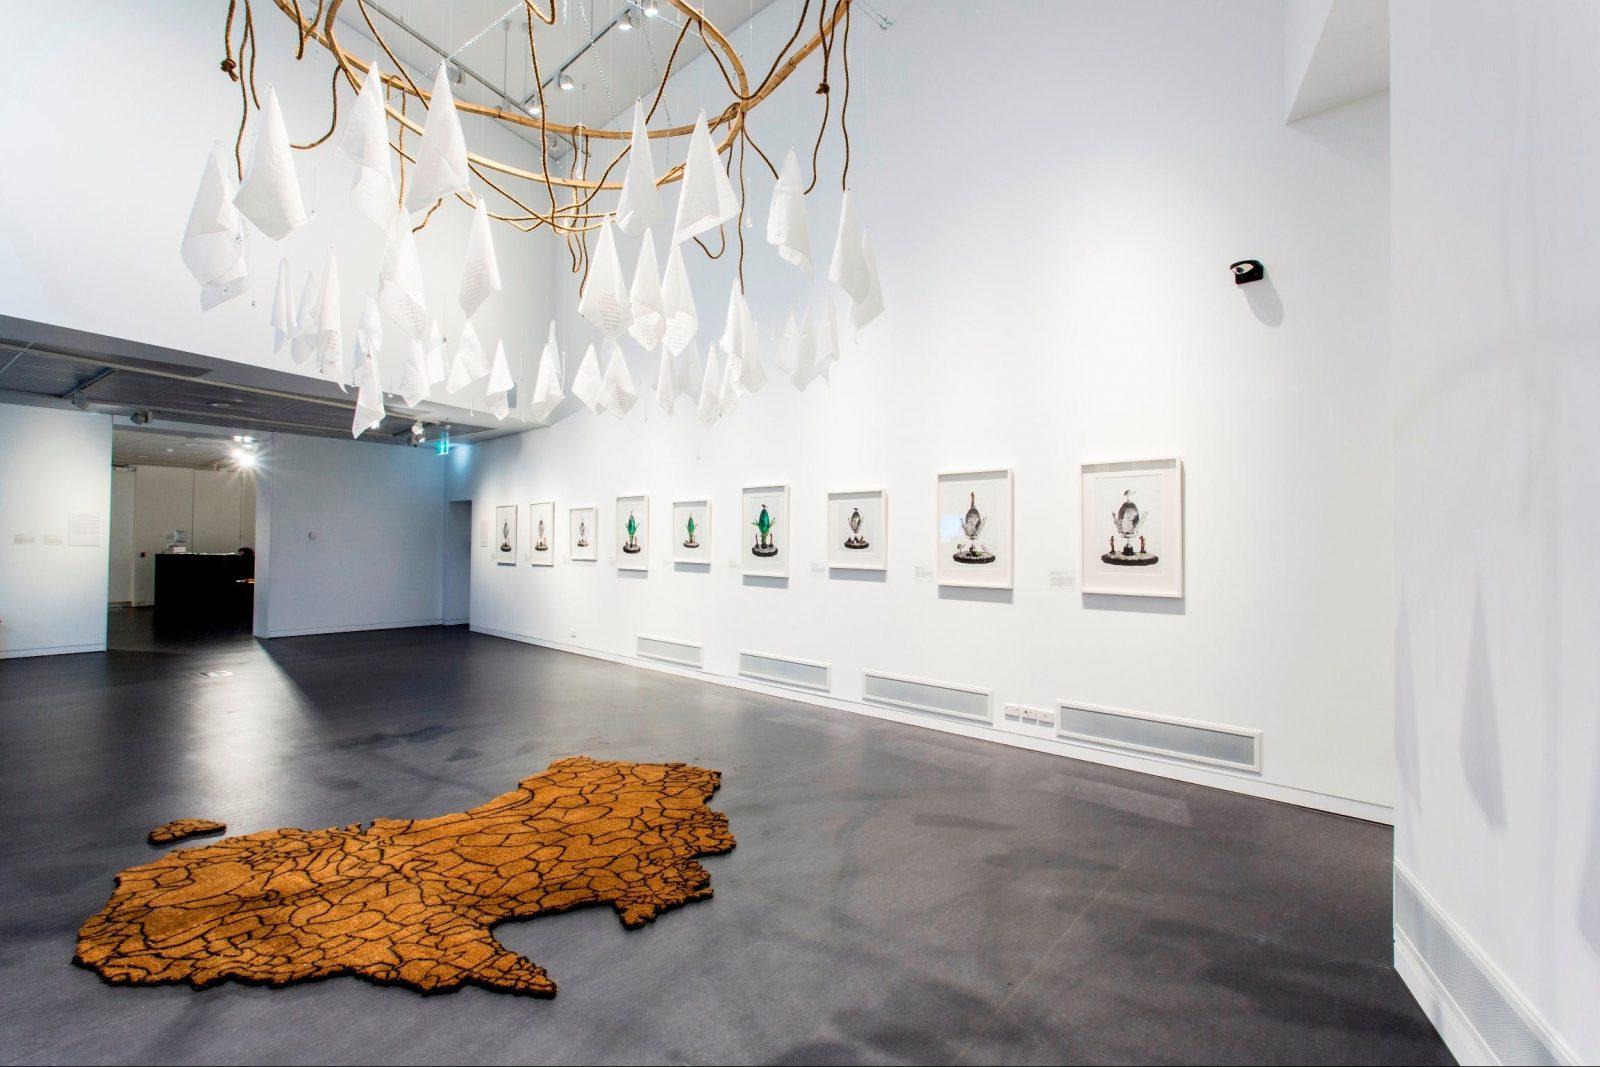 Image of Manningham Art Gallery interior